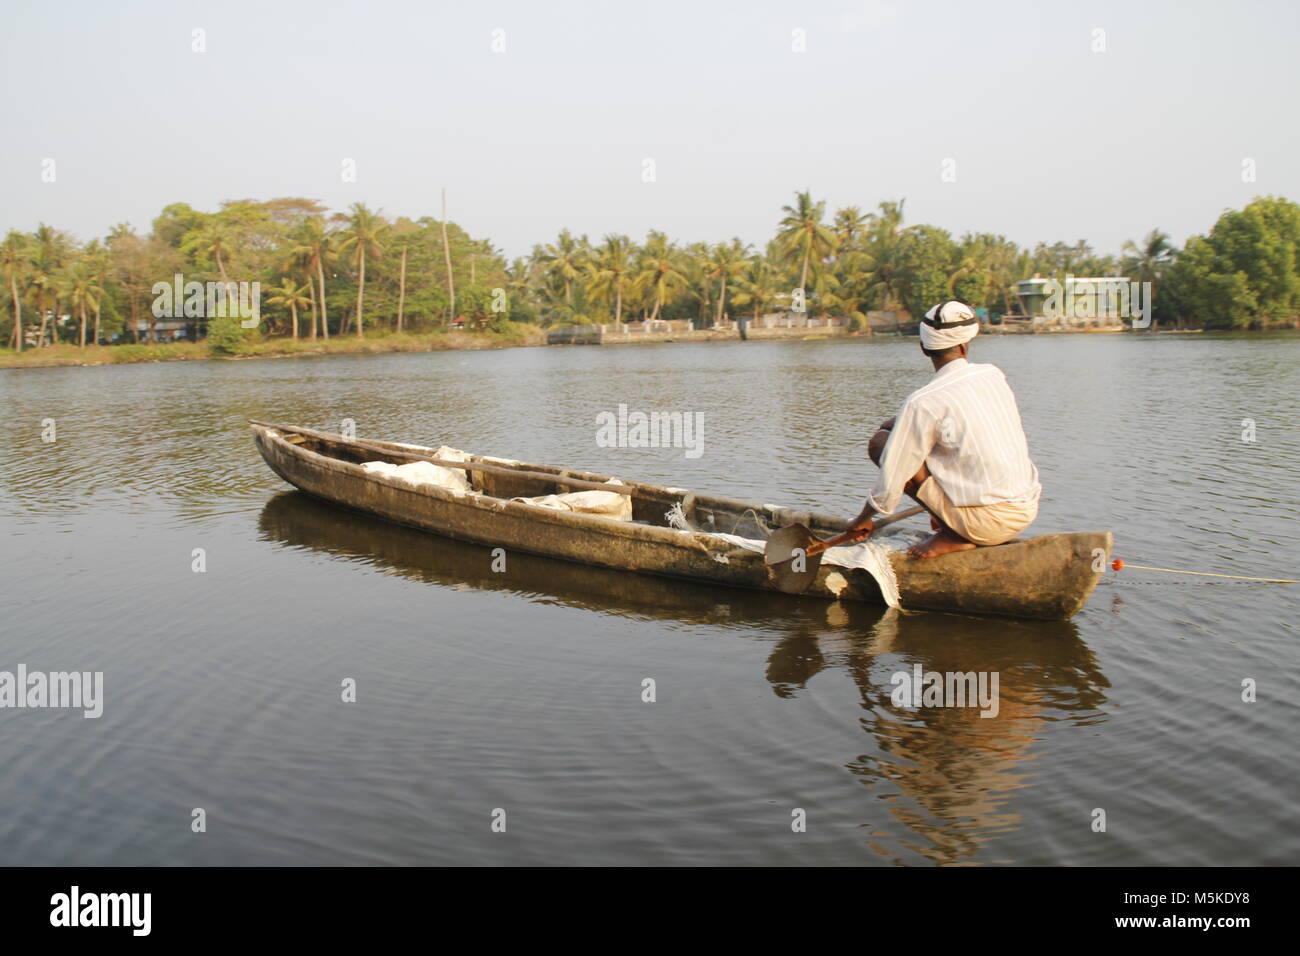 Local fisherman on his board in the backwaters of alapuzha, kerala, India - Stock Image